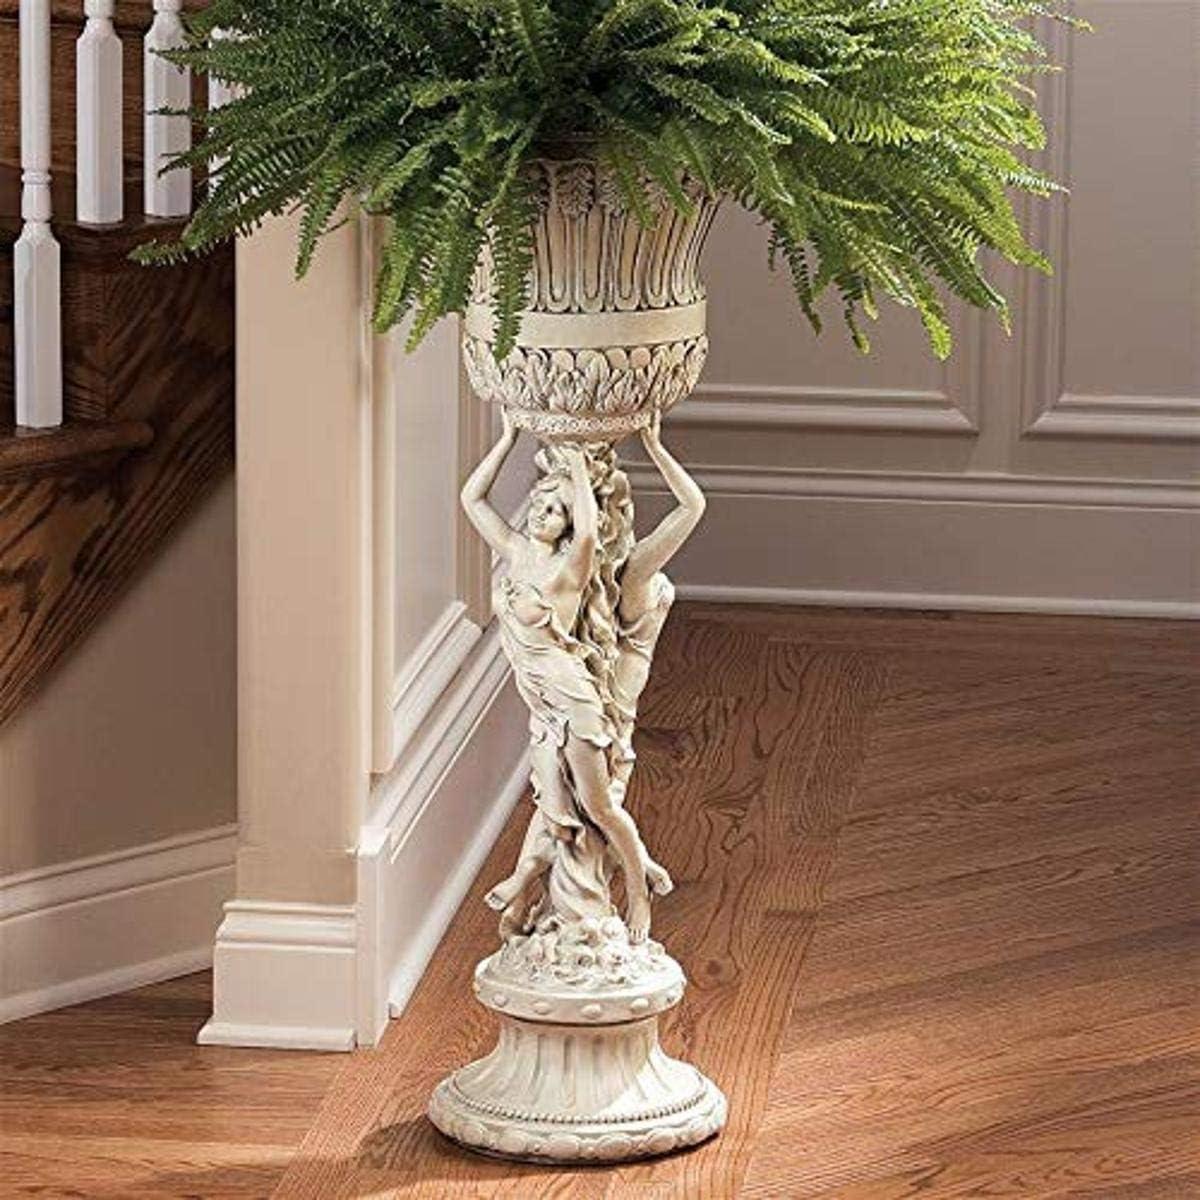 Design Toscano Chatsworth Manor Neoclassical Sculptural Pedestal